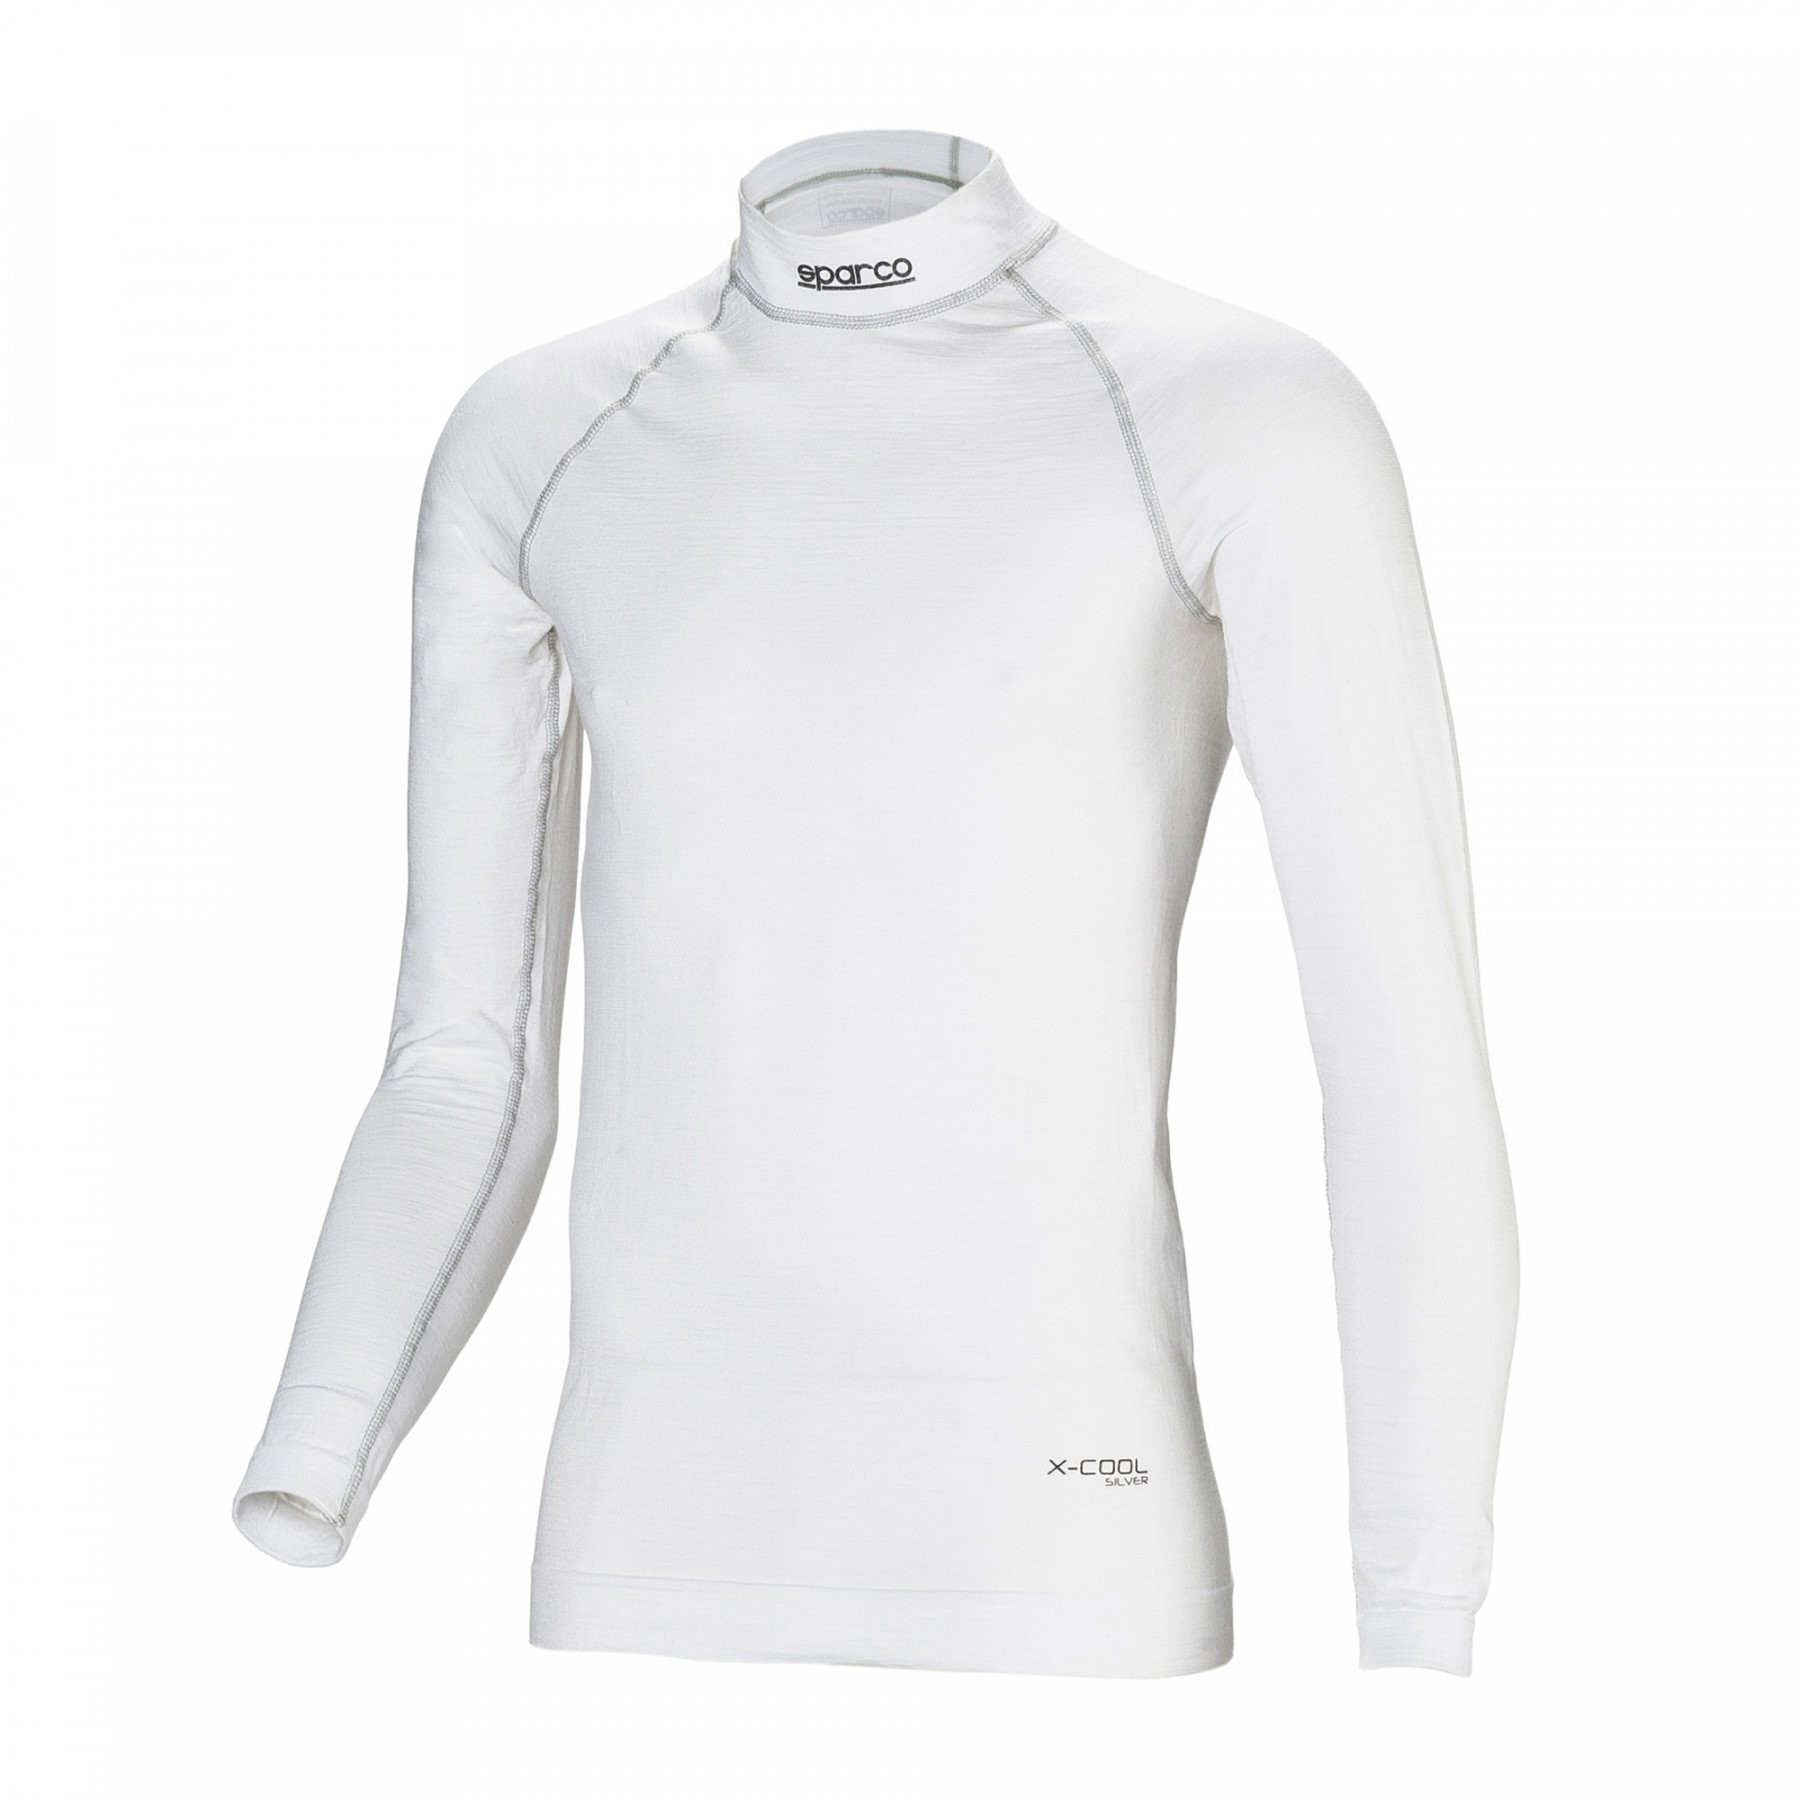 Нов продукт: Sparco Sheild RW-9, FIA Top Long Sleeve, White